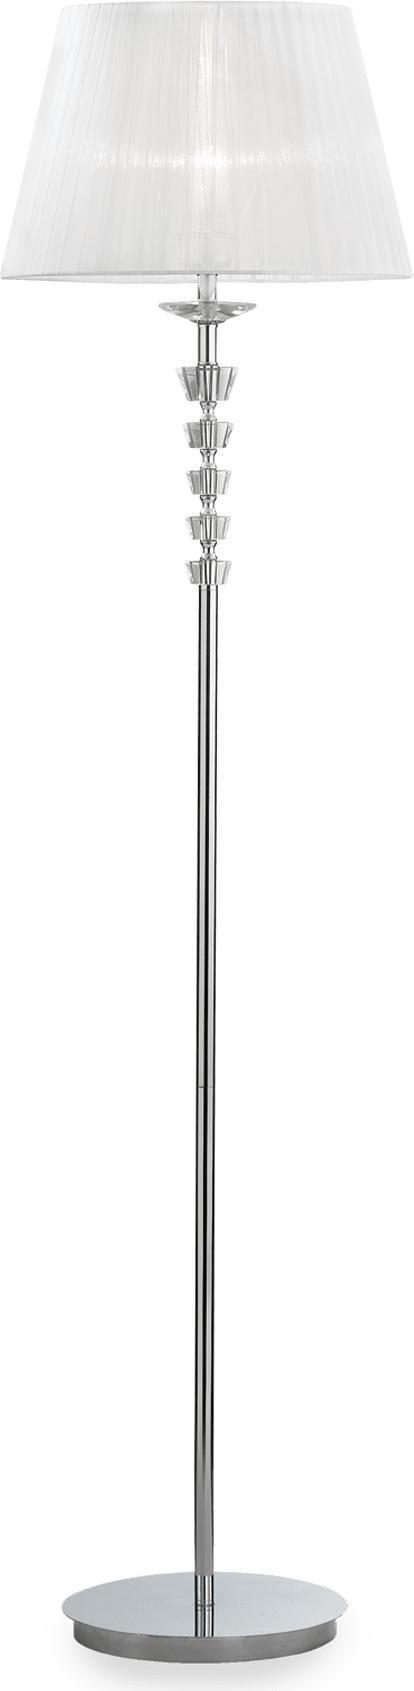 Ideal lux LED Pegaso Lampe stehende 5W 59228